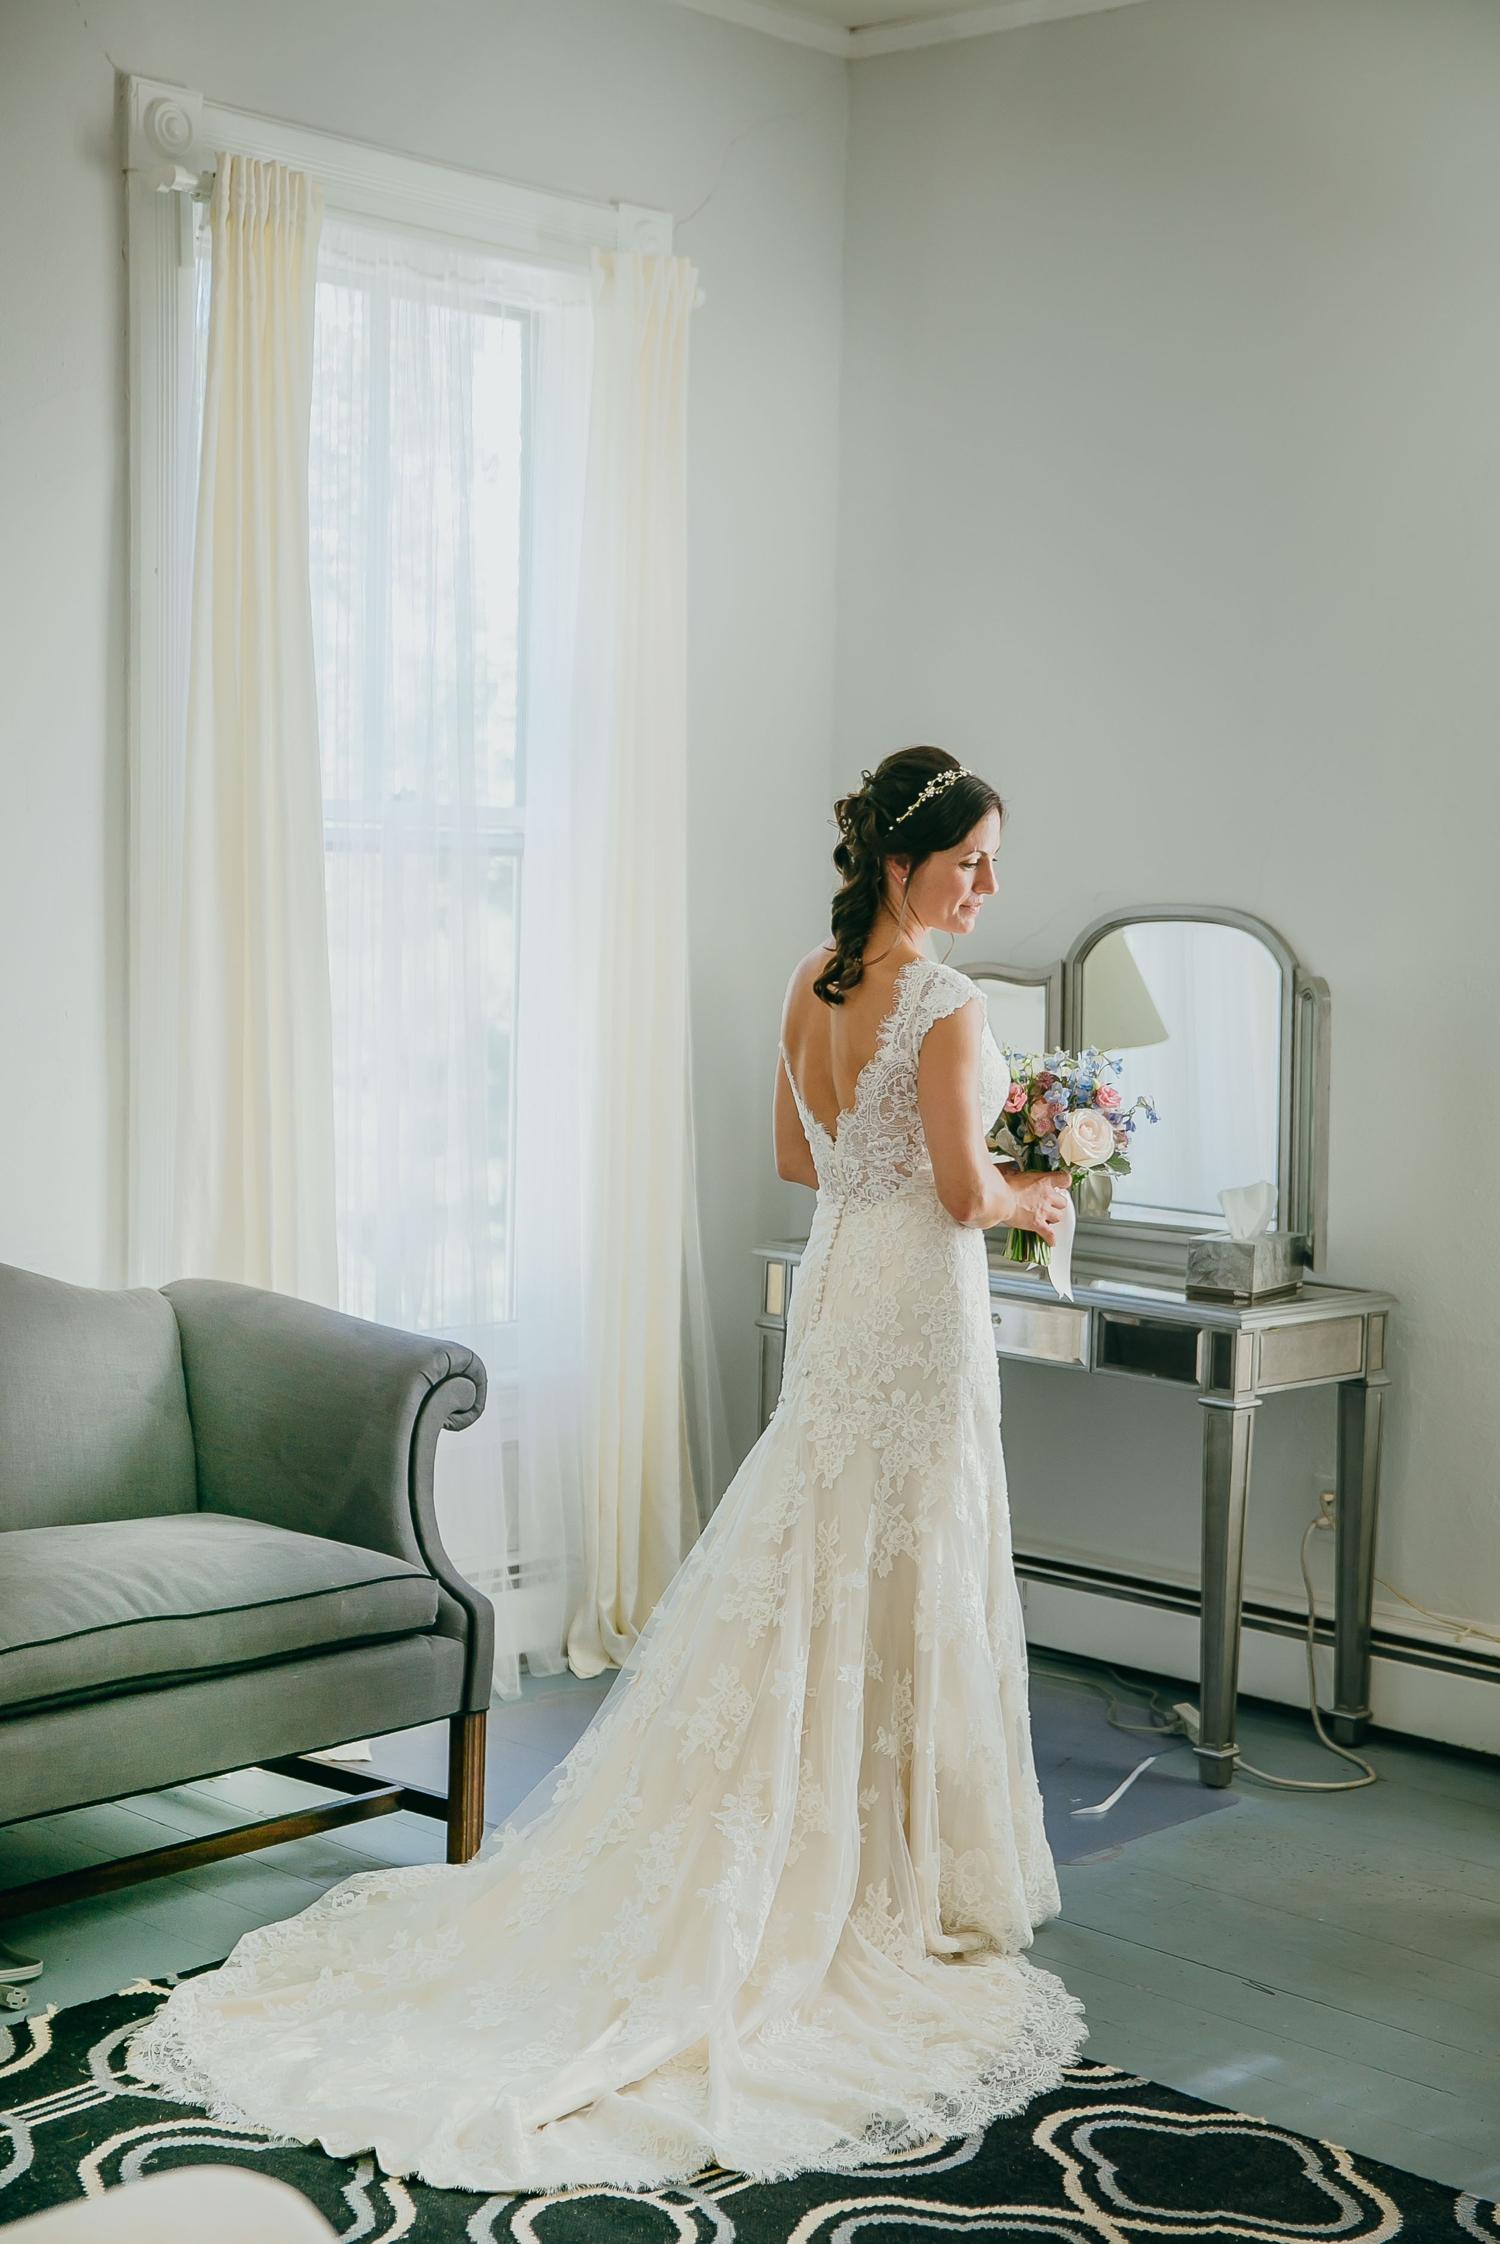 ny wedding photographer 15.jpg